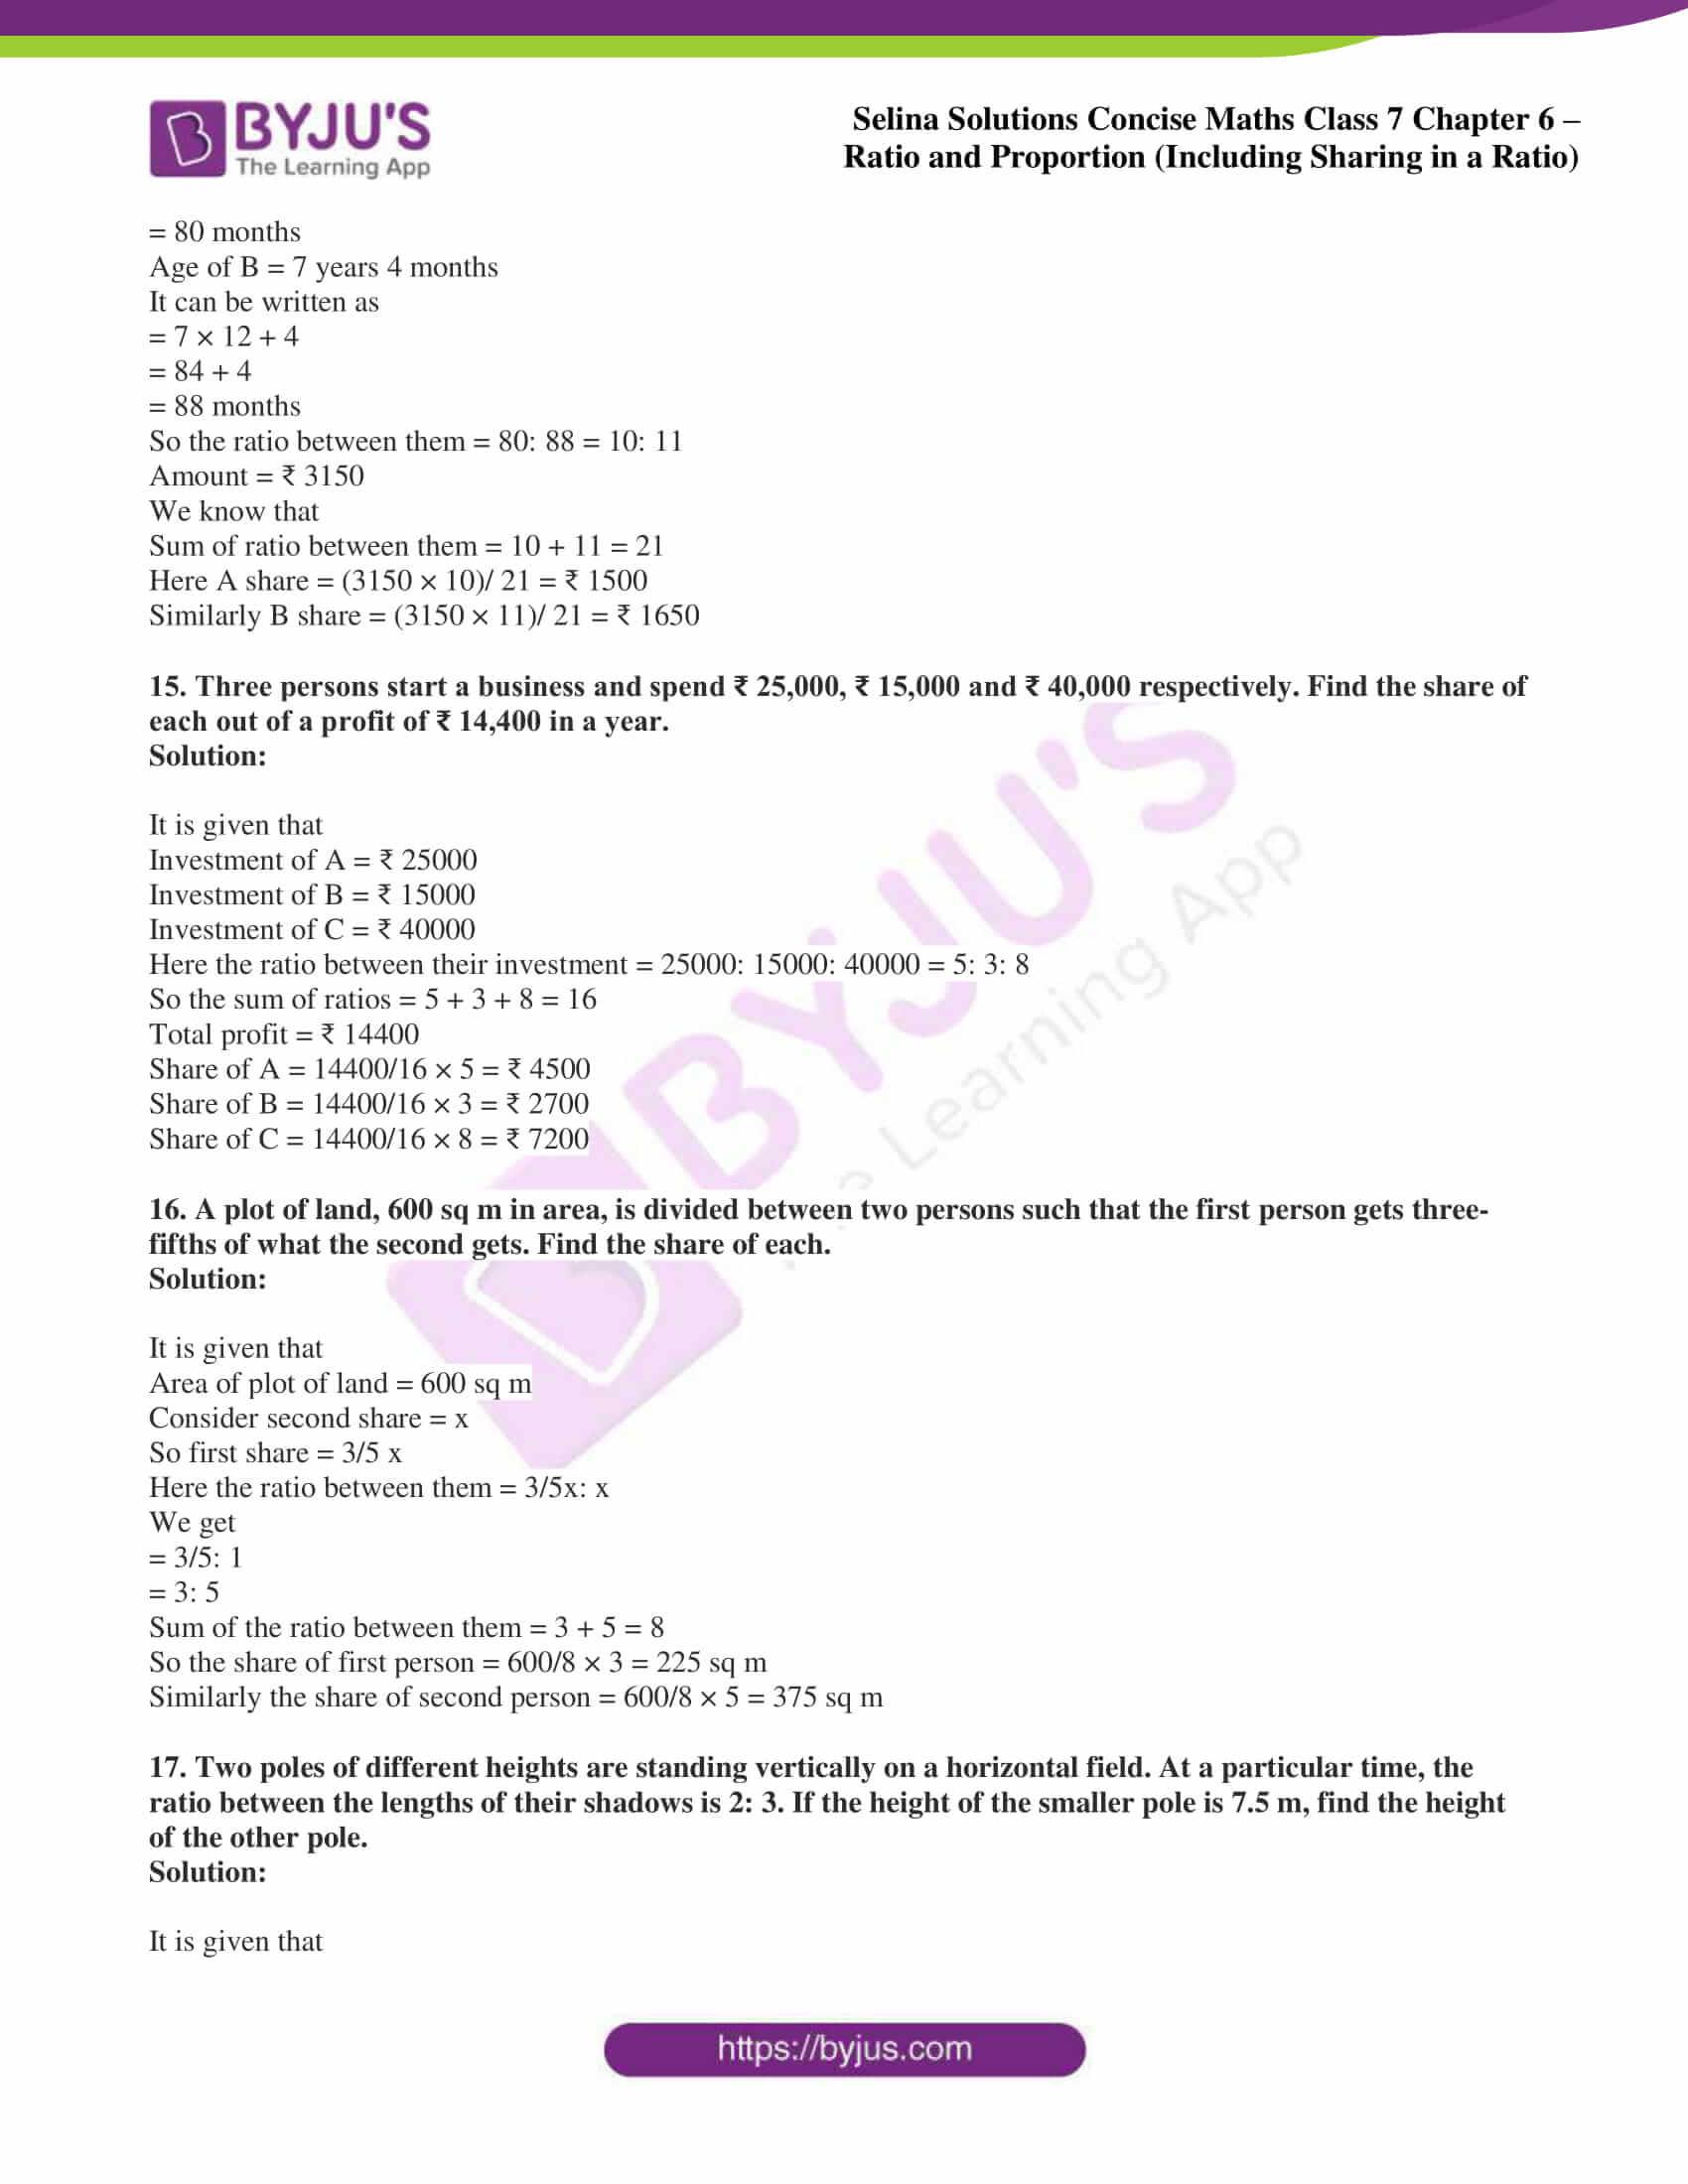 selina sol concise maths class 7 ch6 ex 6a 7